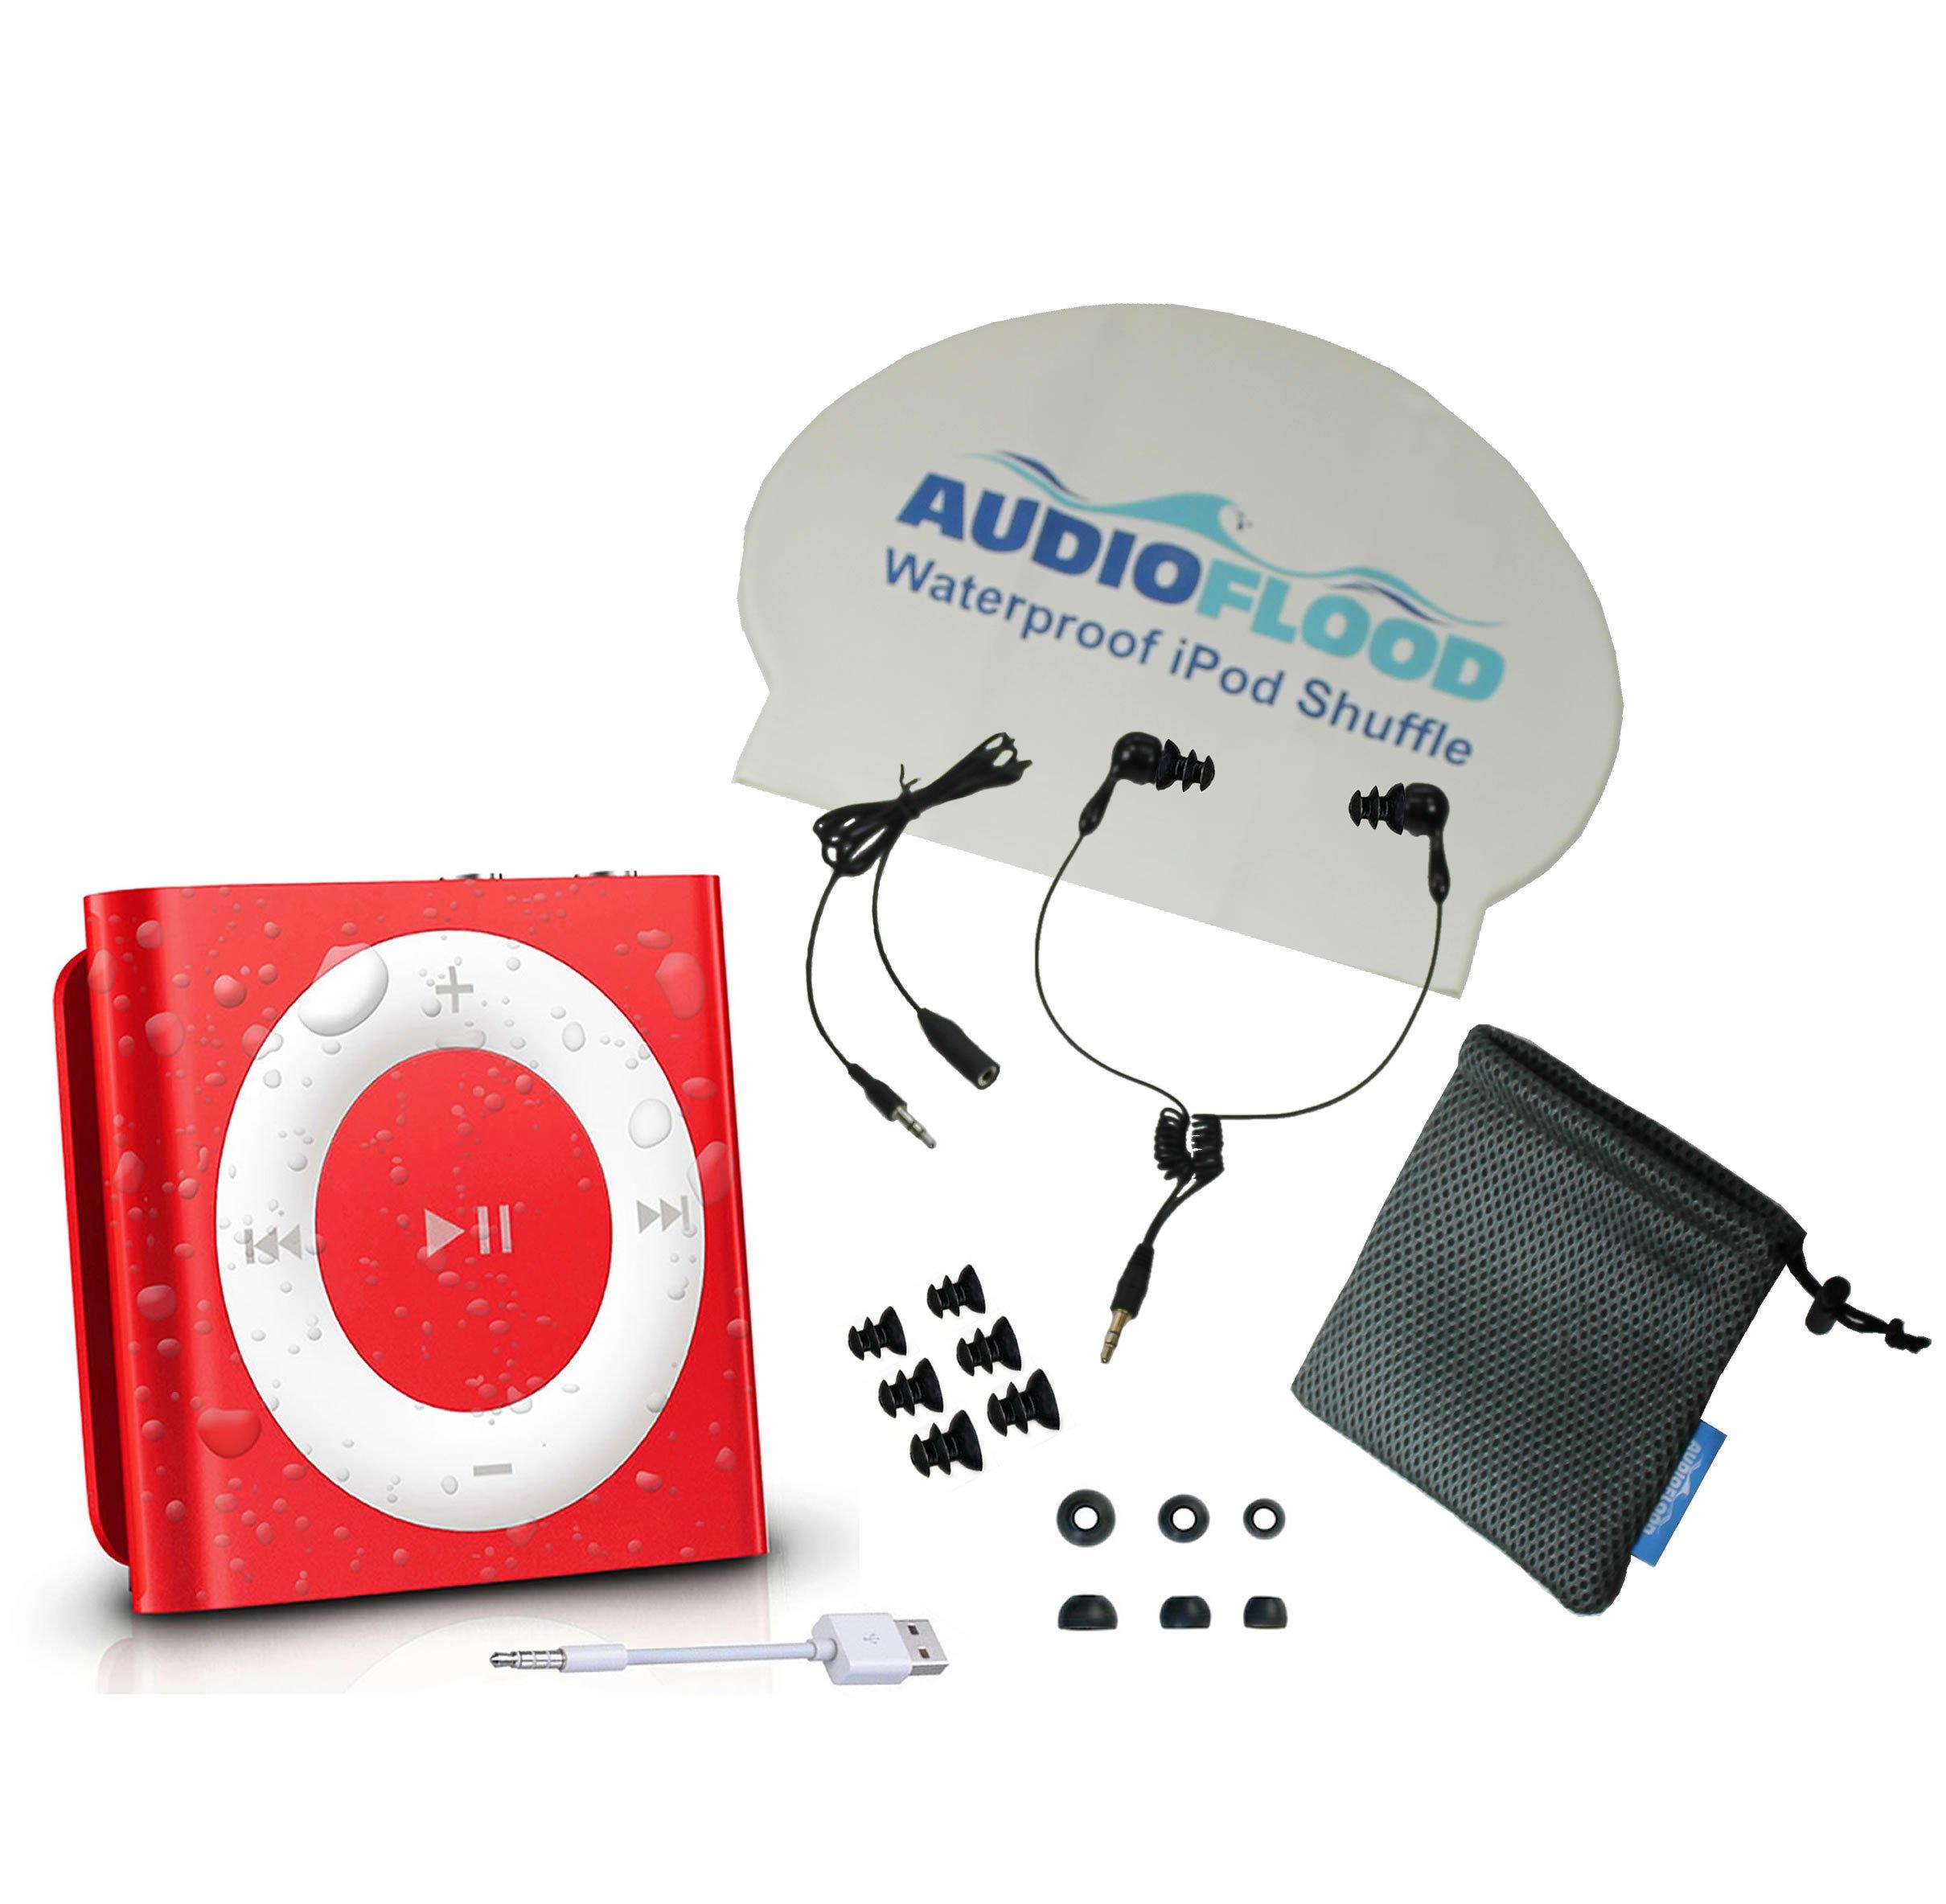 AudioFlood Waterproof Apple iPod Shuffle with True Short Cord Headphones - Red